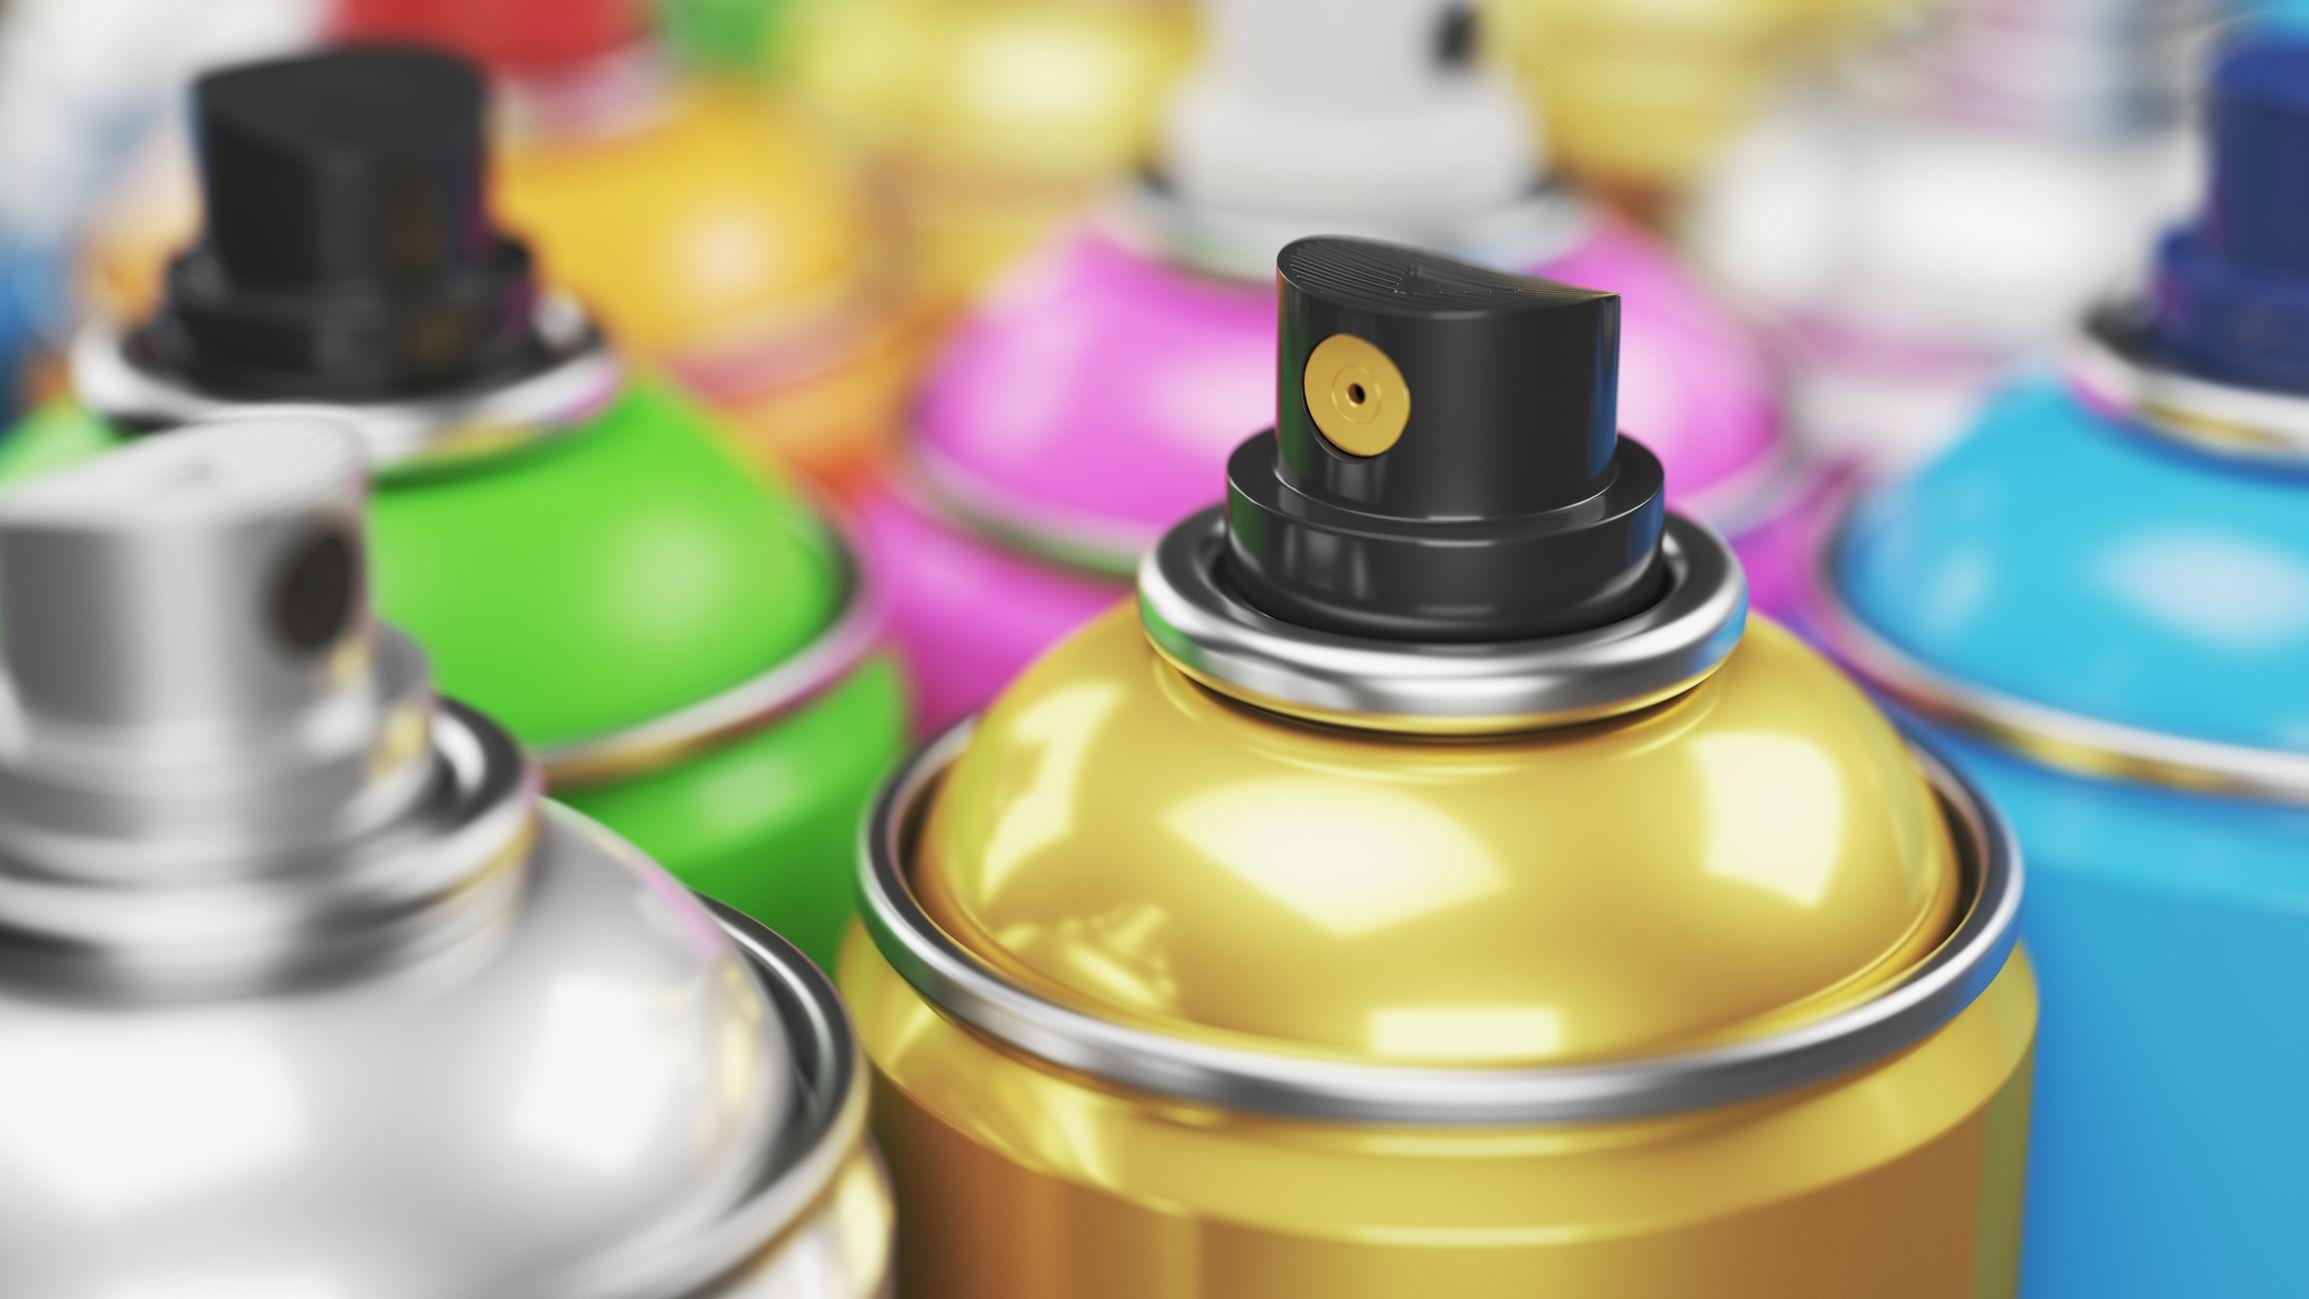 aerosol-can-spray-stock